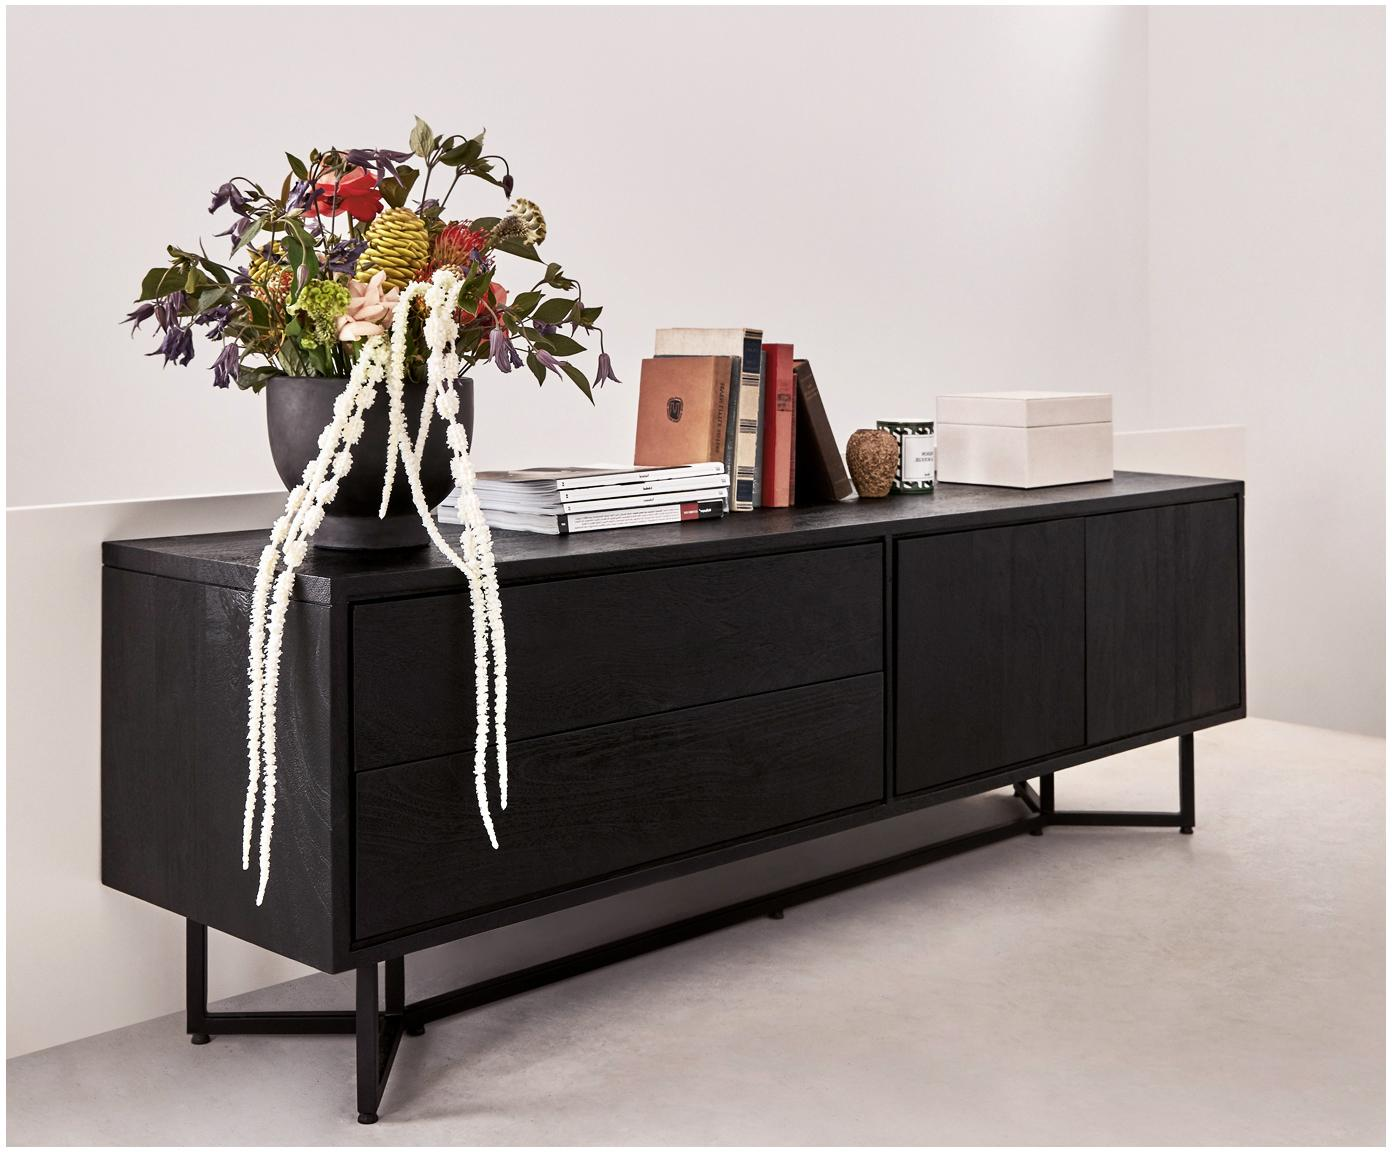 Dressoir Luca van massief hout, Frame: gepoedercoat metaal, Raamwerk: zwart, gelakt. Frame: mat zwart, 160 x 70 cm